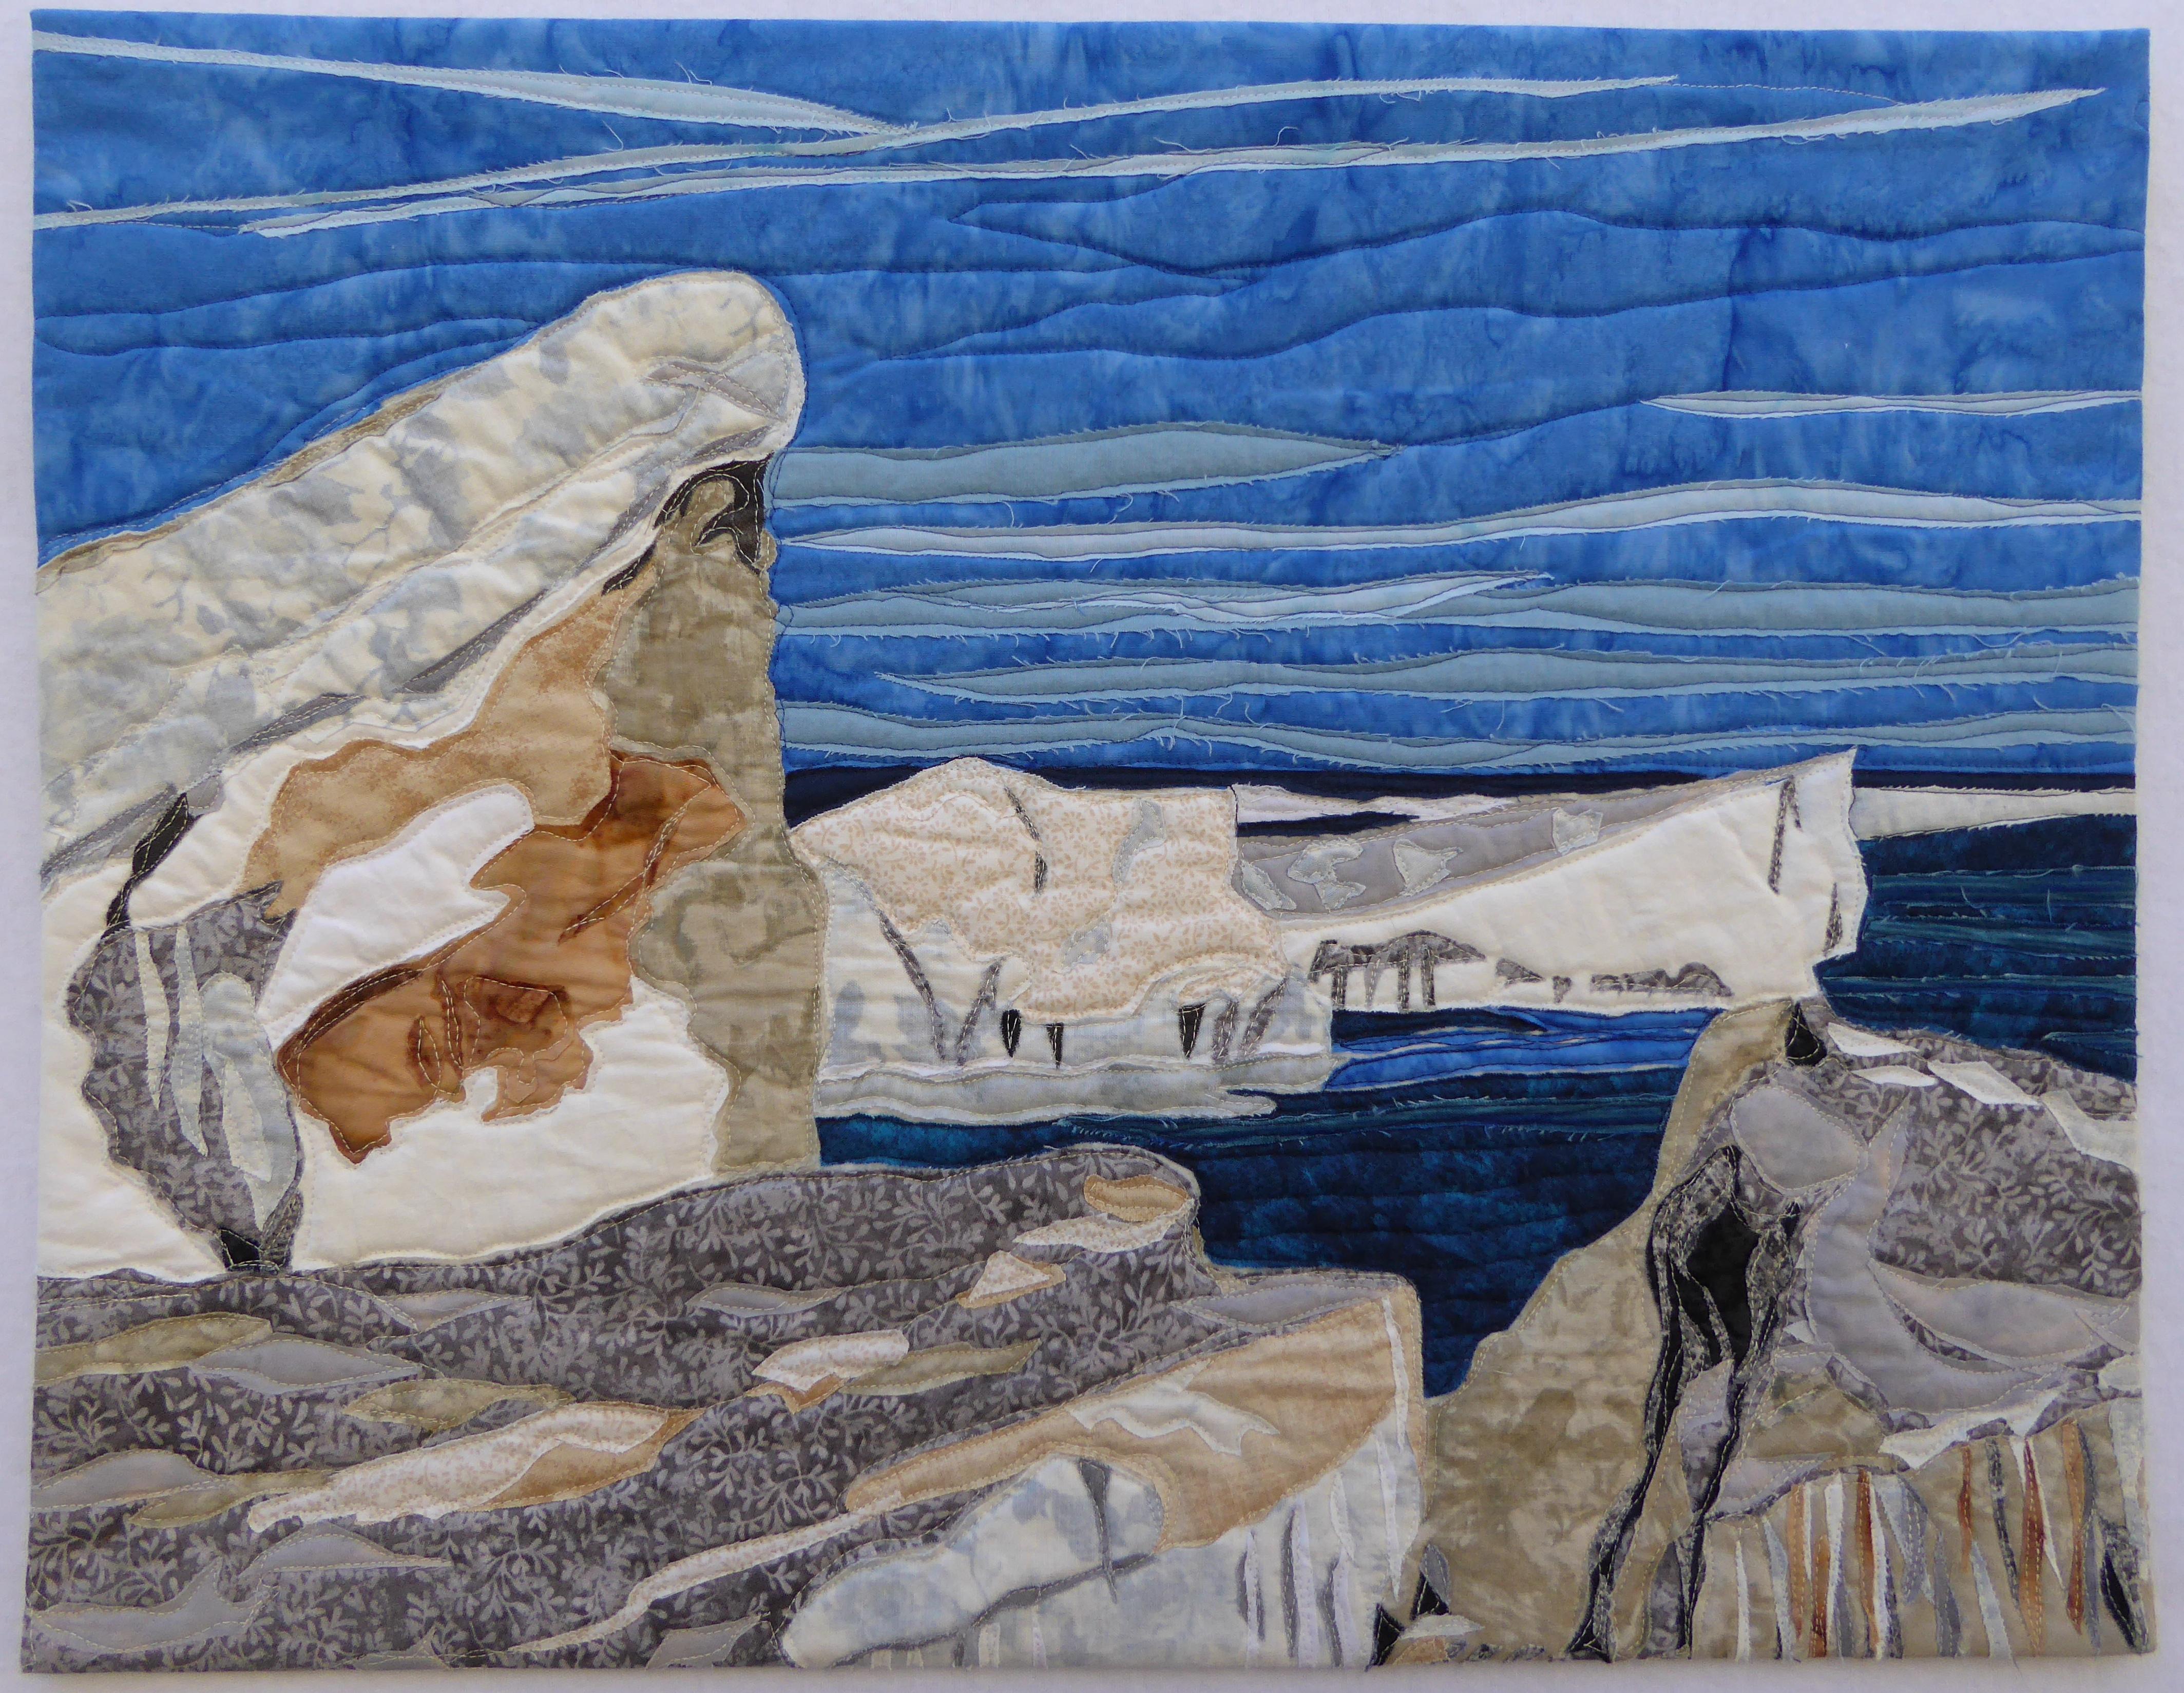 Sheboygan Ice, 17H x 21W, Textile, $600